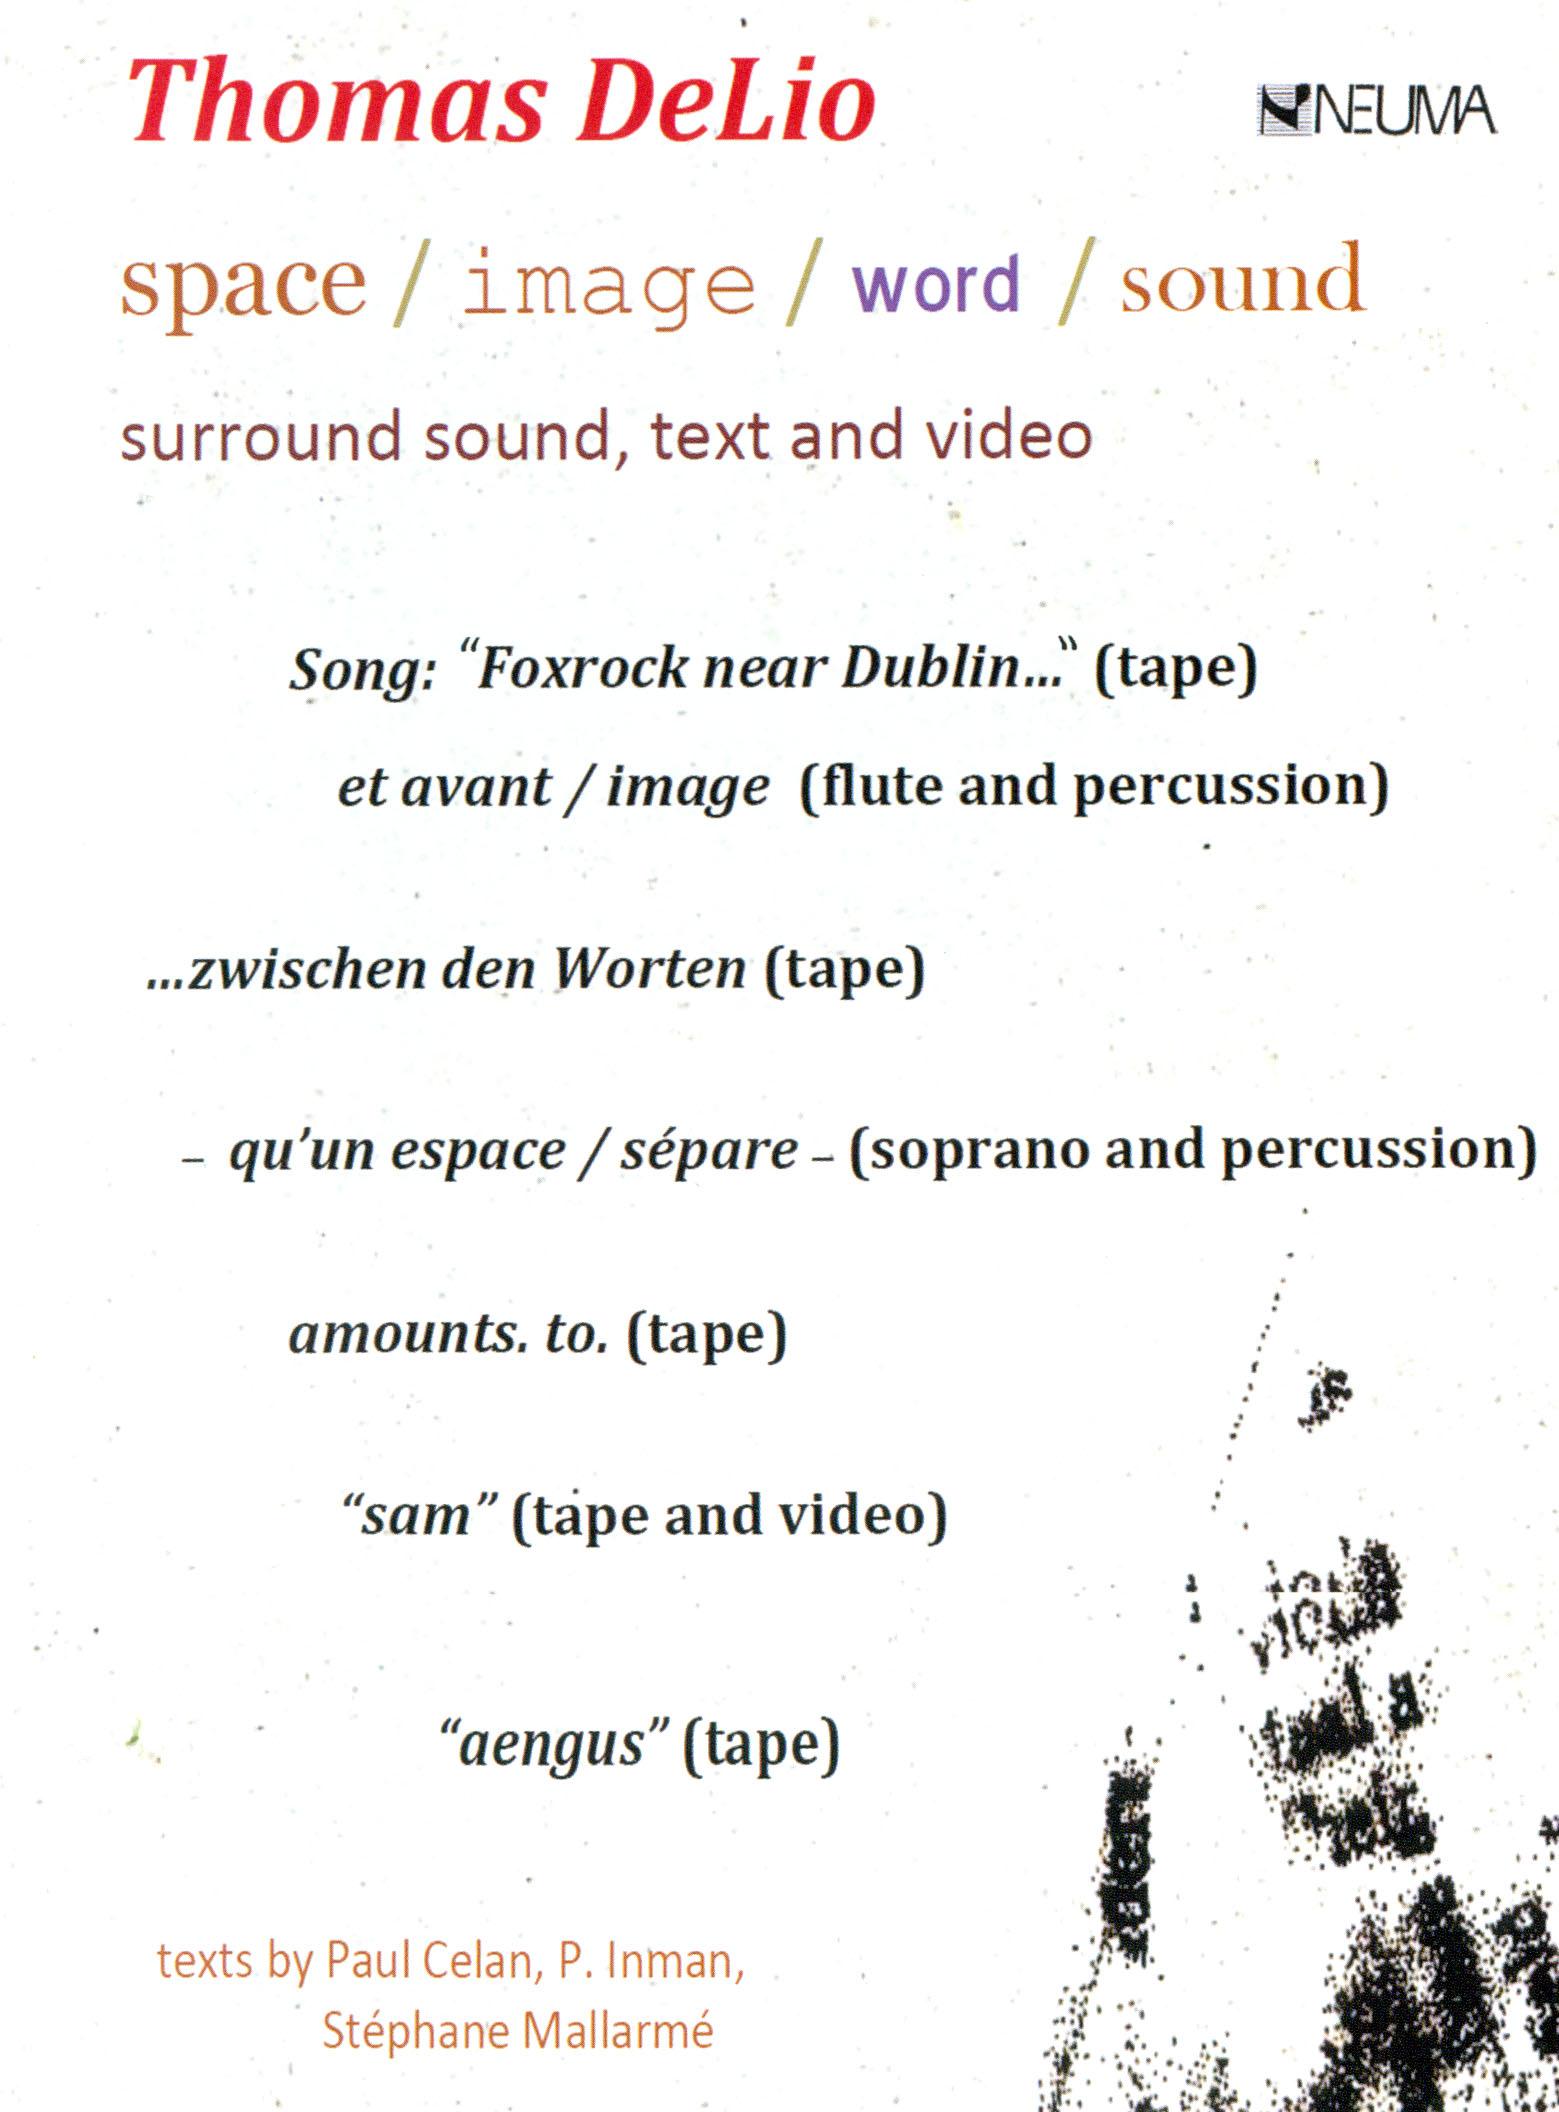 Thomas DeLio: Space/Image/Word/Sound